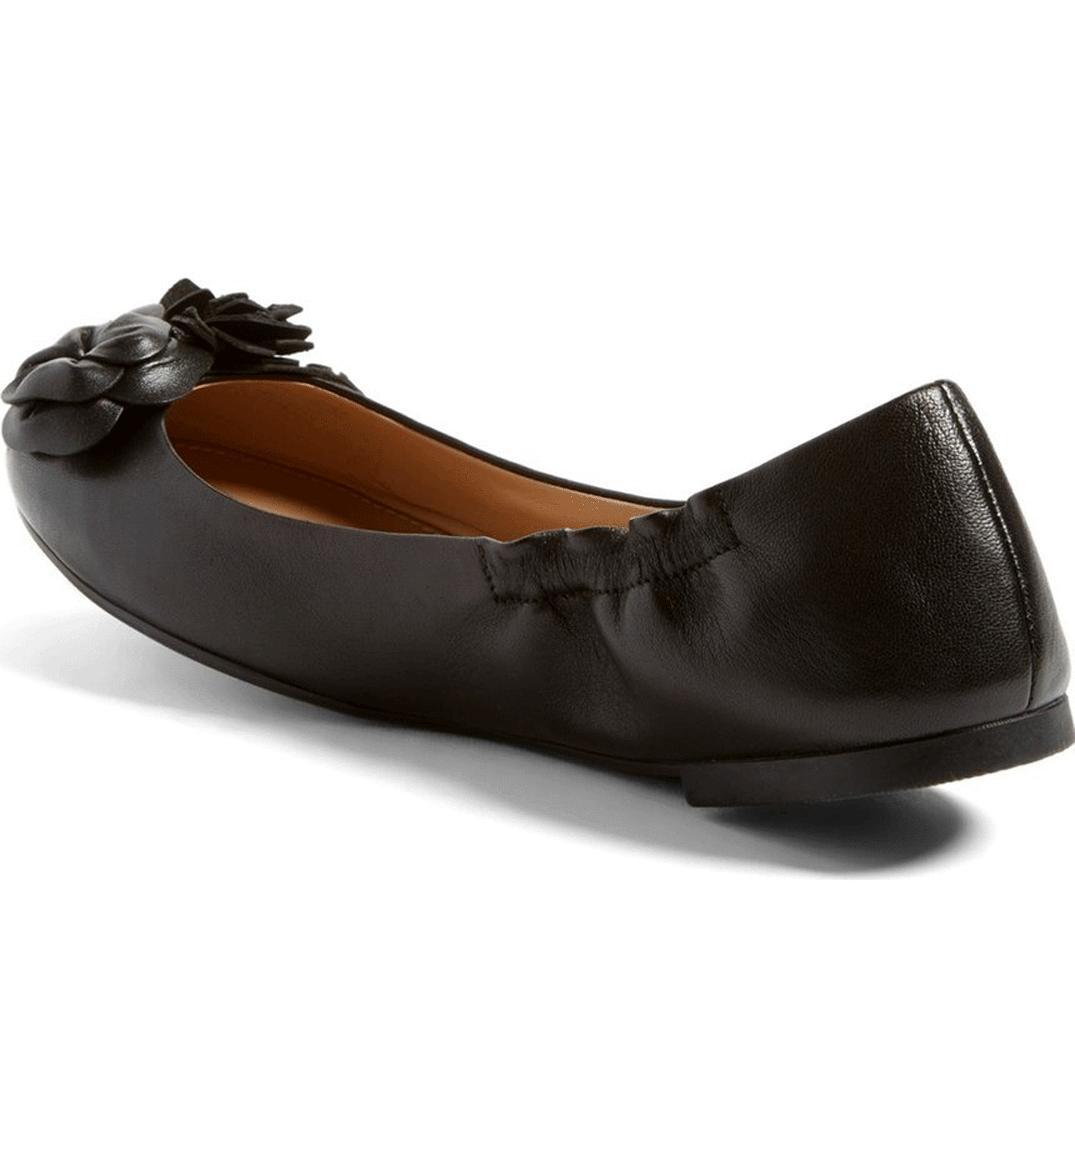 fe0cff09f008 Tory Burch Blossom Ballerina Flats Black Leather Ballet Shoe Flower 7.5 Reva